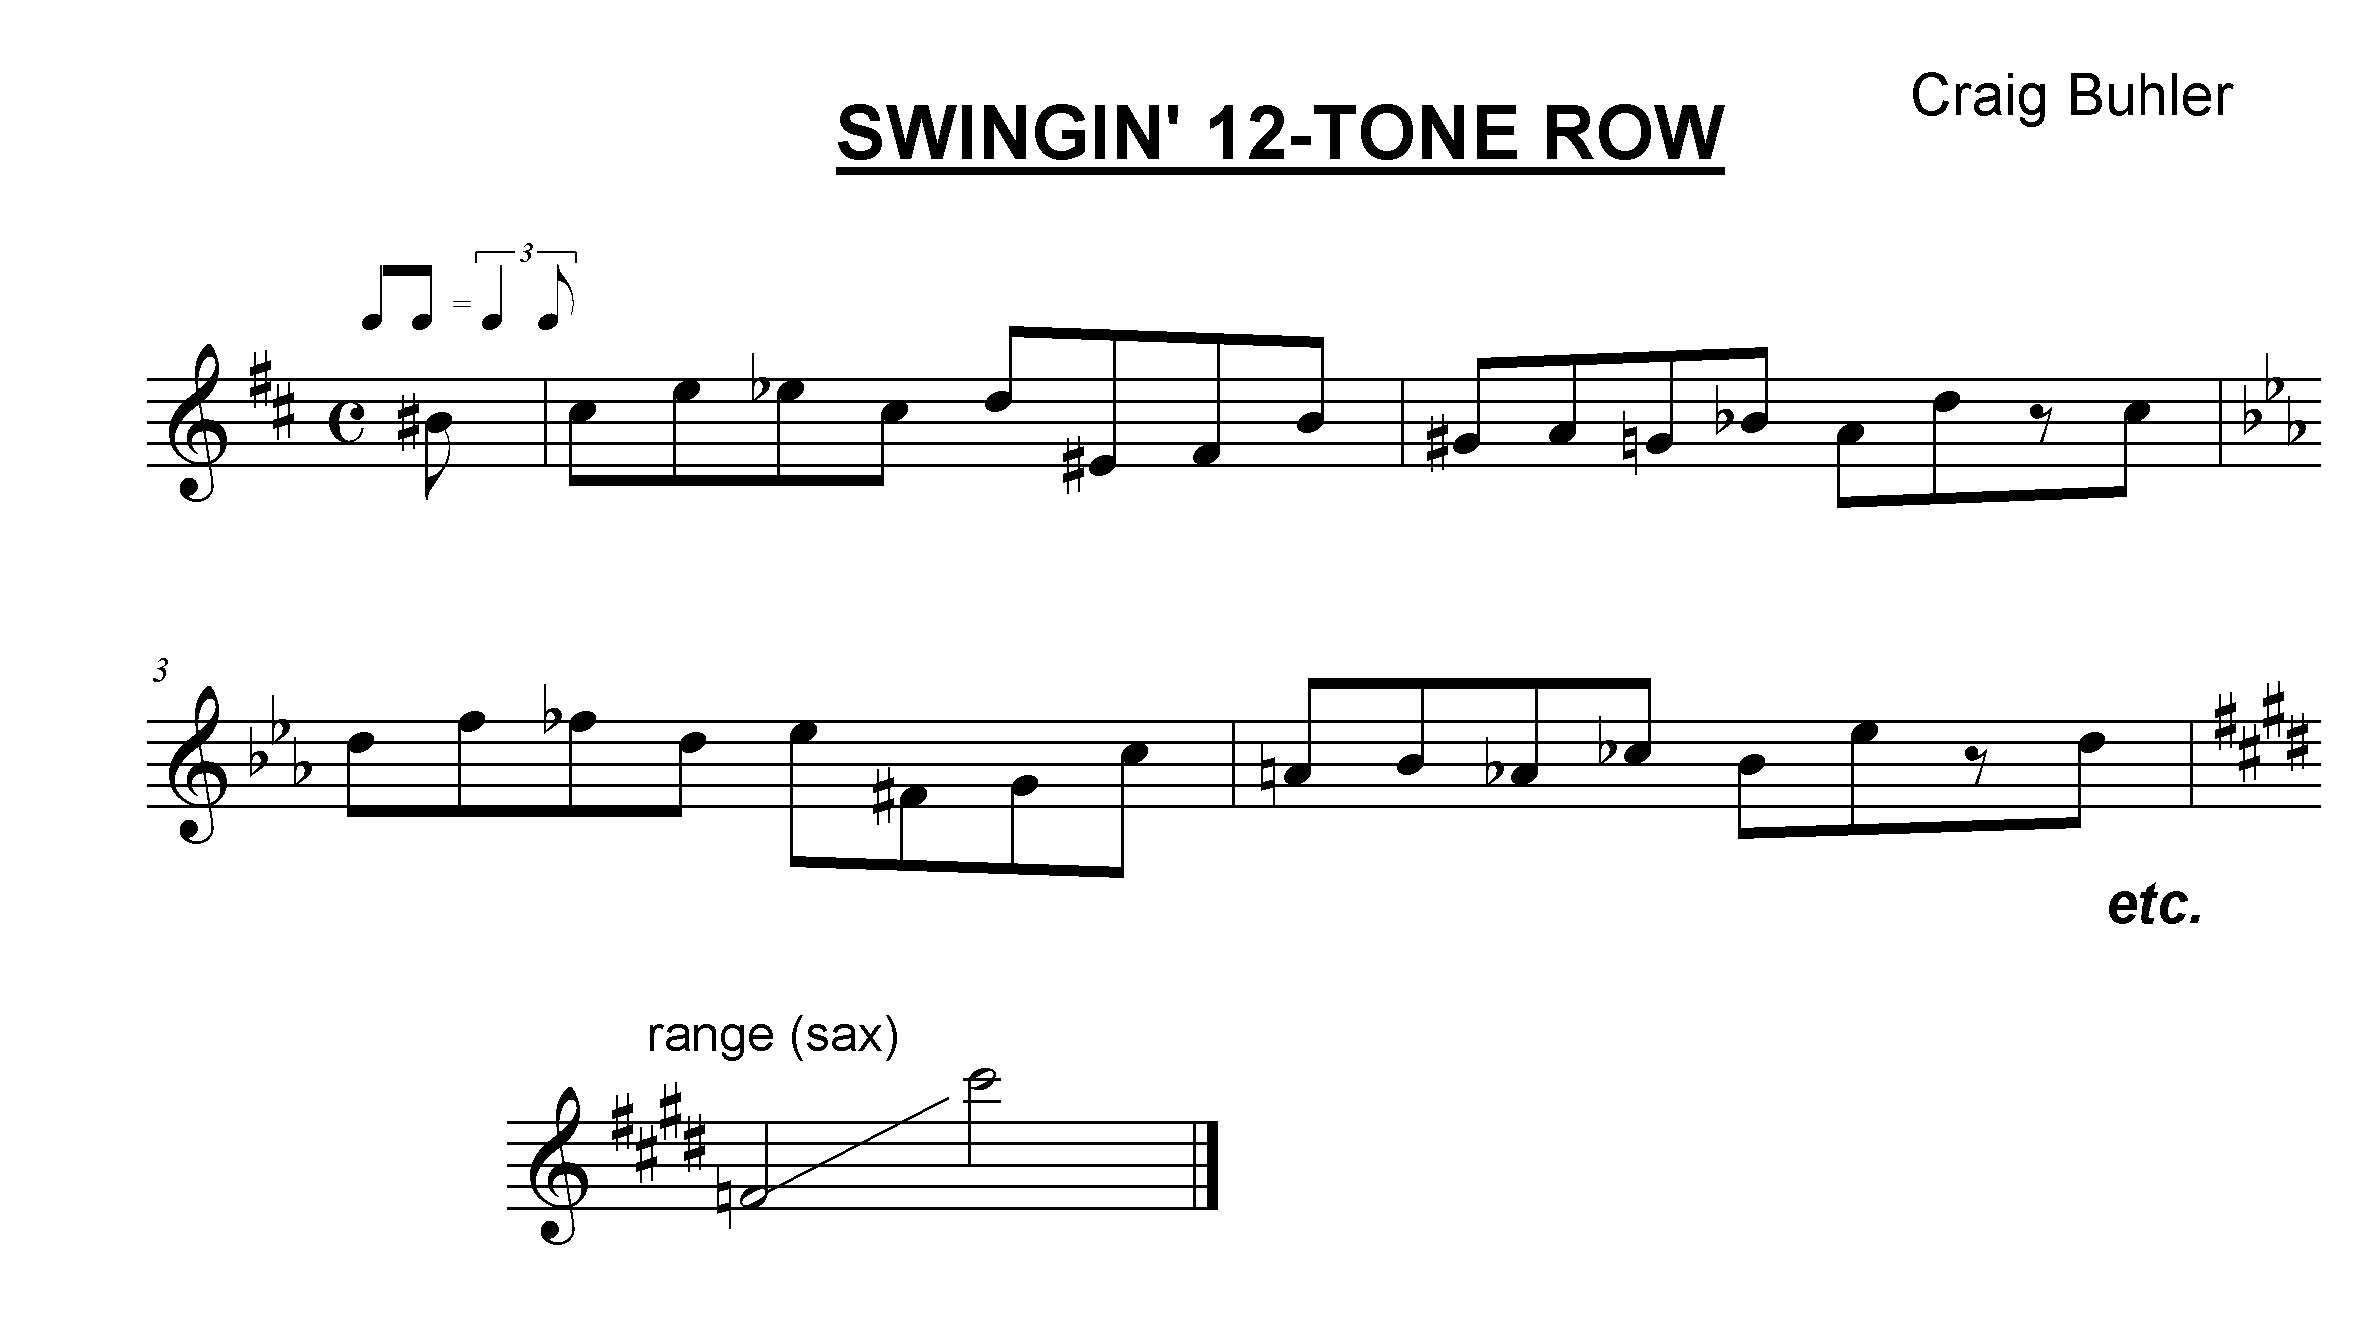 SWINGIN 12 TONE ROW